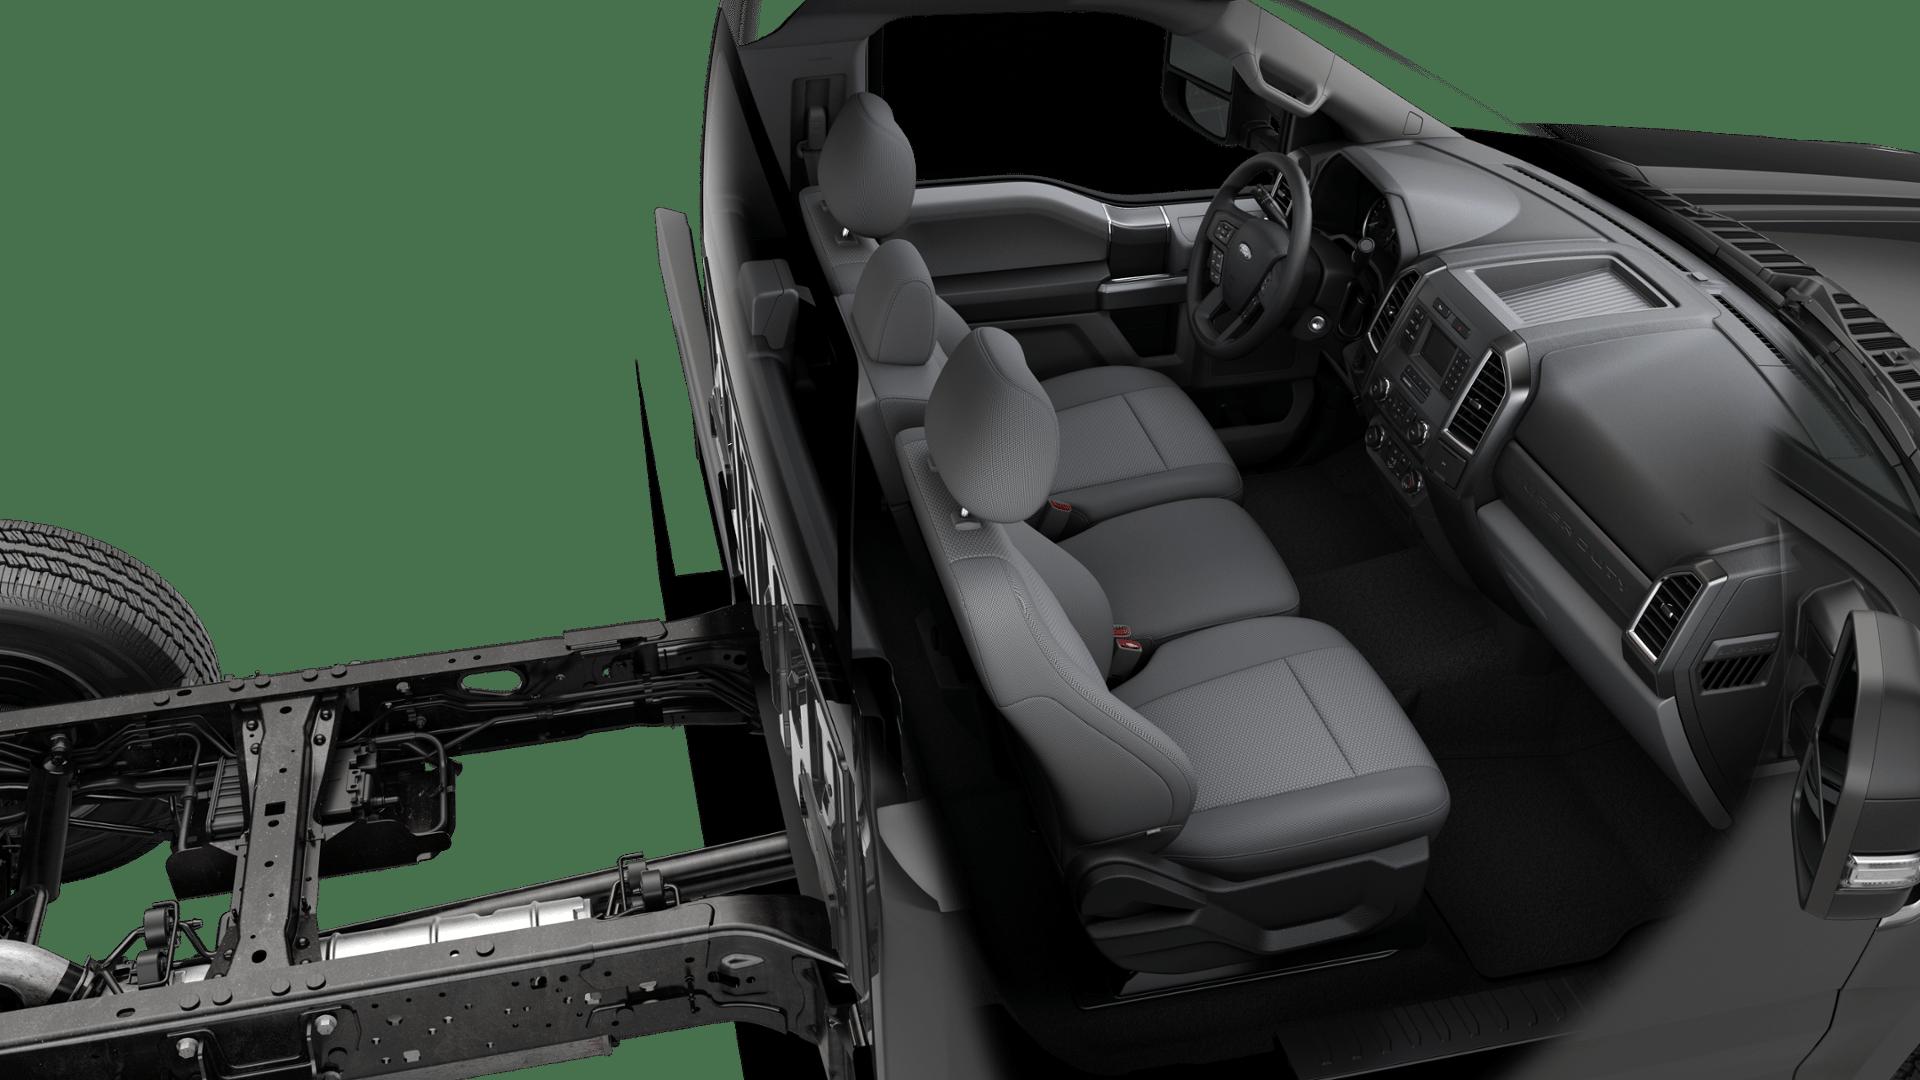 2019 F-350 Regular Cab DRW 4x4,  Cab Chassis #N8346 - photo 6